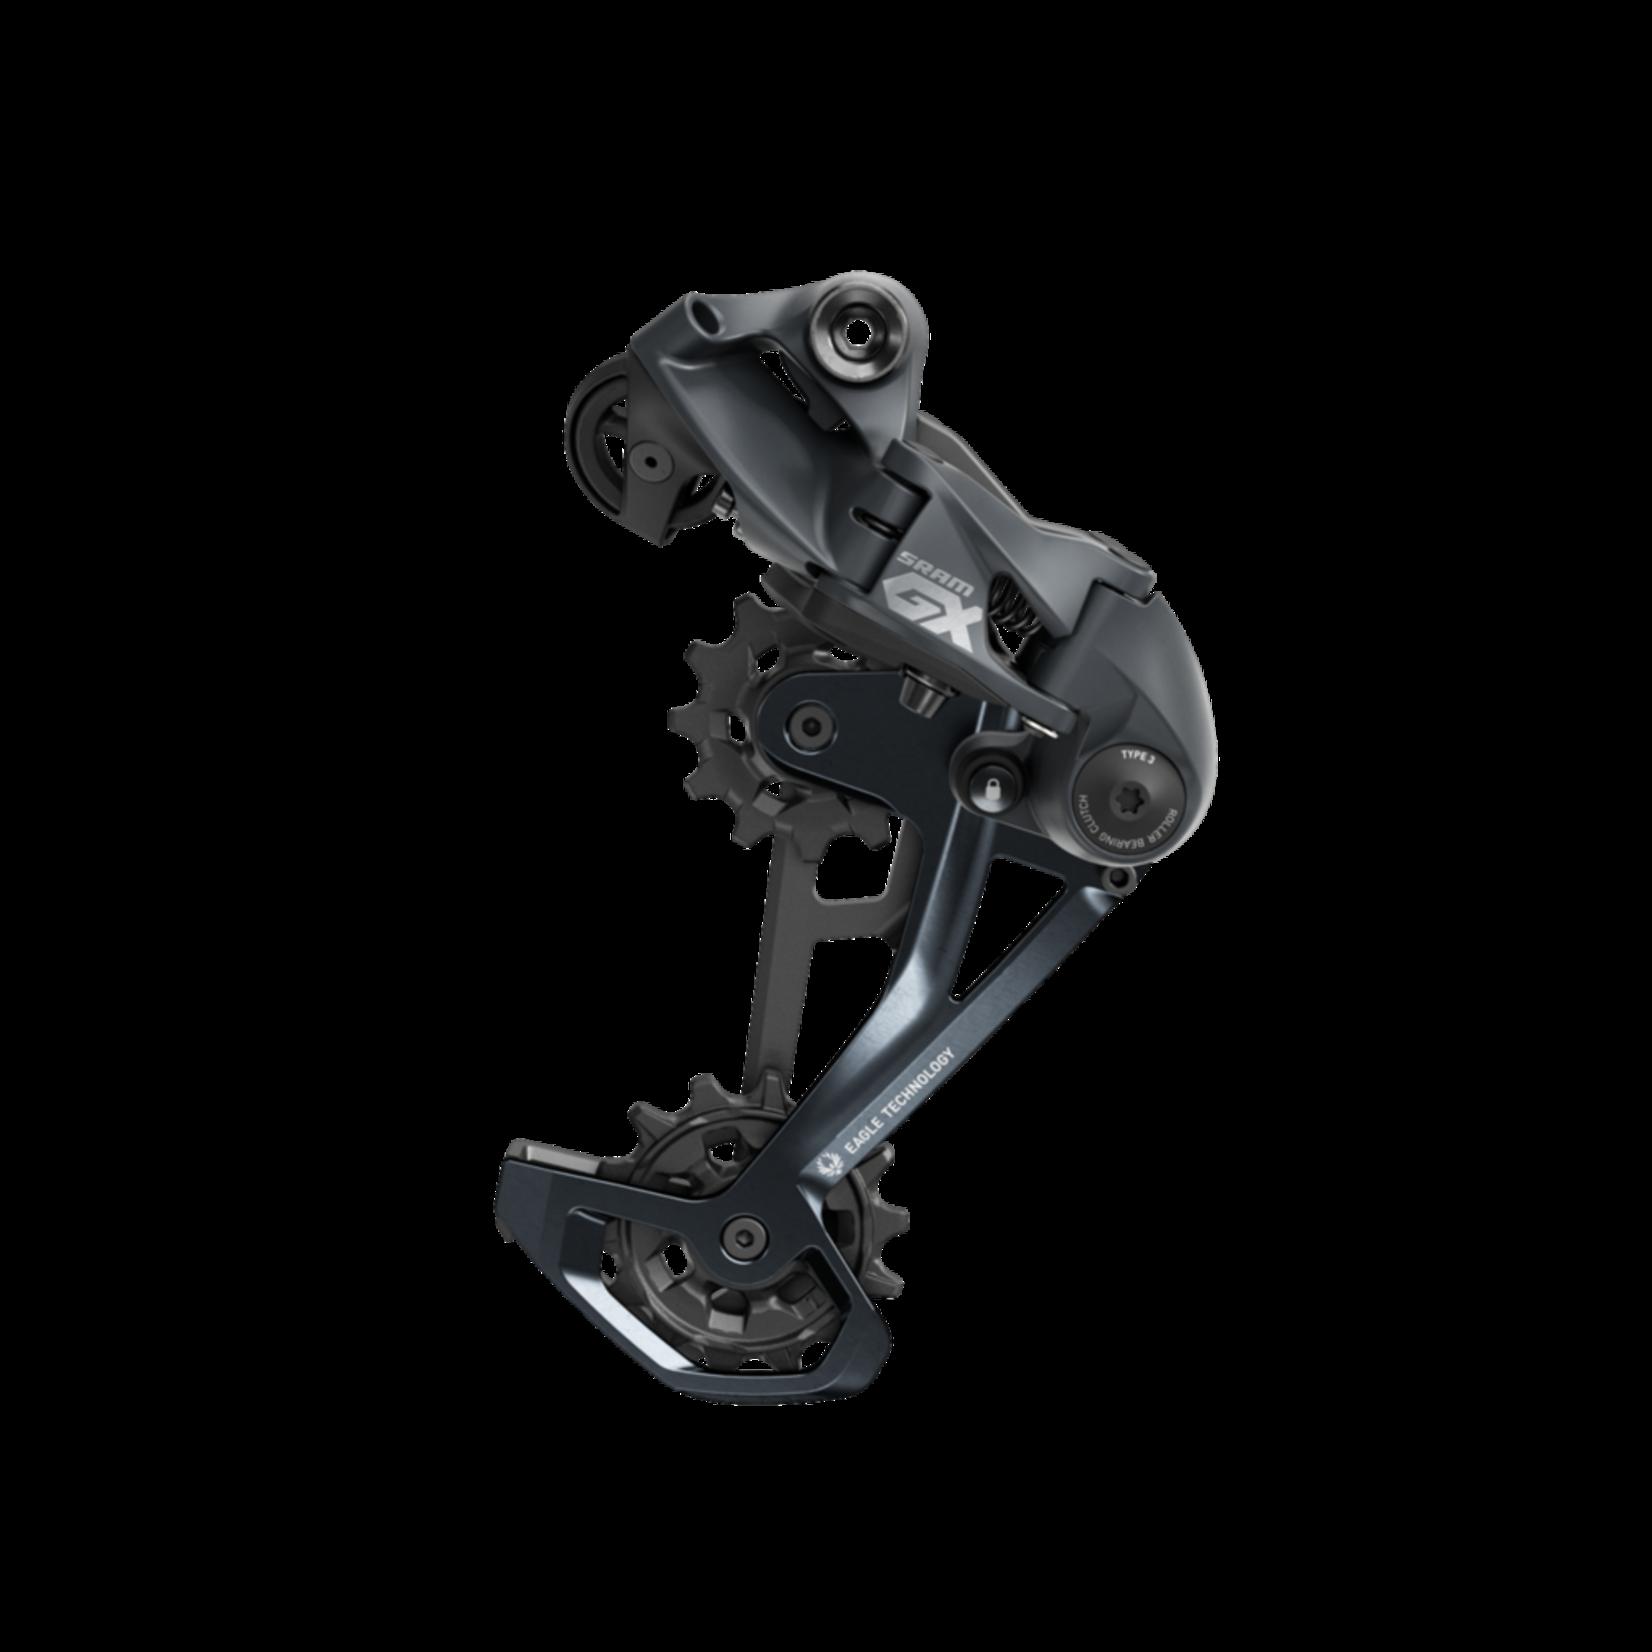 SRAM SRAM GX Eagle Rear Derailleur - 12-Speed - 52t Max - Lunar